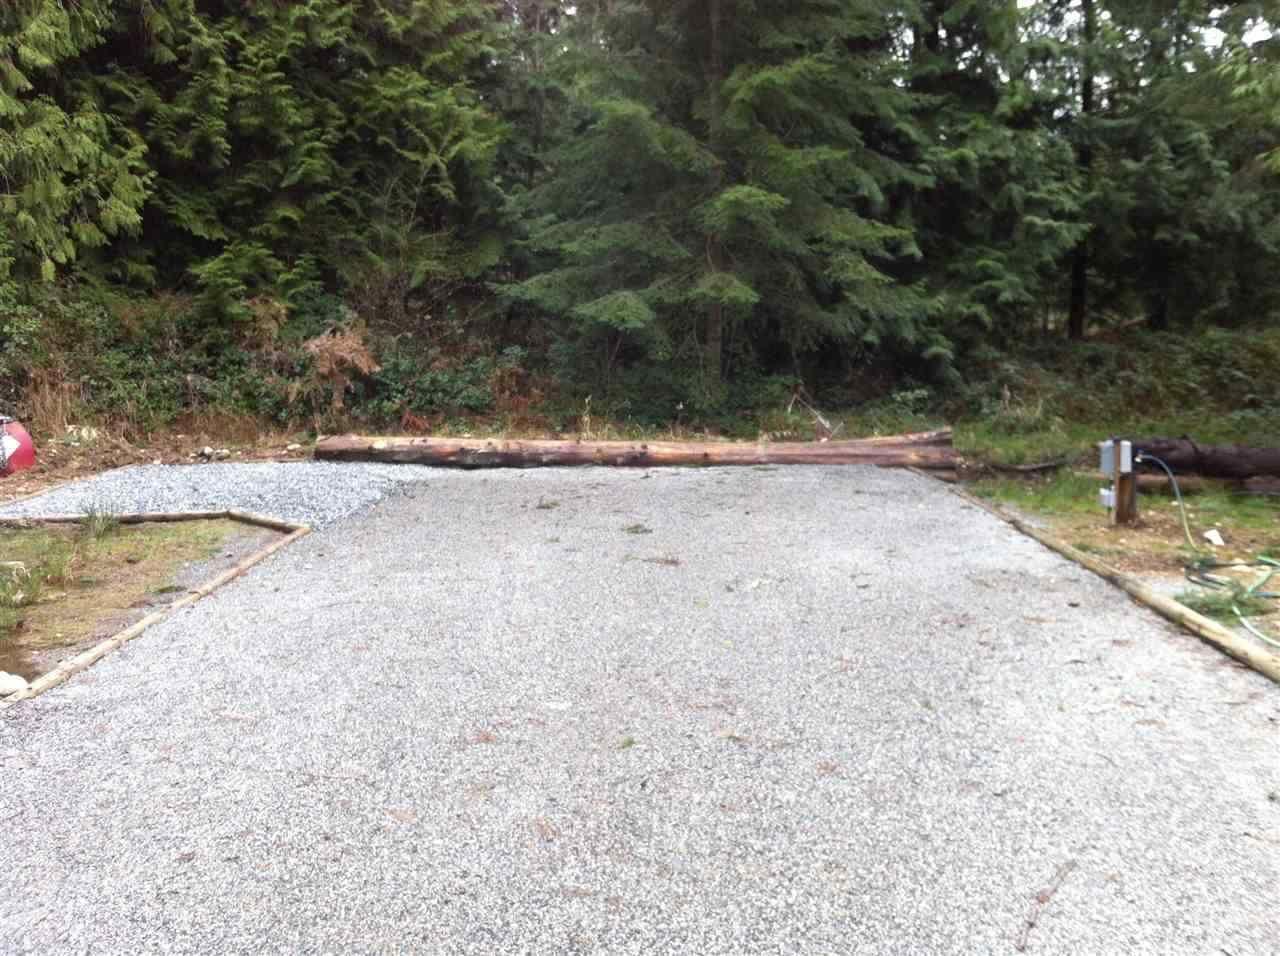 Photo 15: Photos: 908/930 BYNG Road: Roberts Creek House for sale (Sunshine Coast)  : MLS®# R2173400